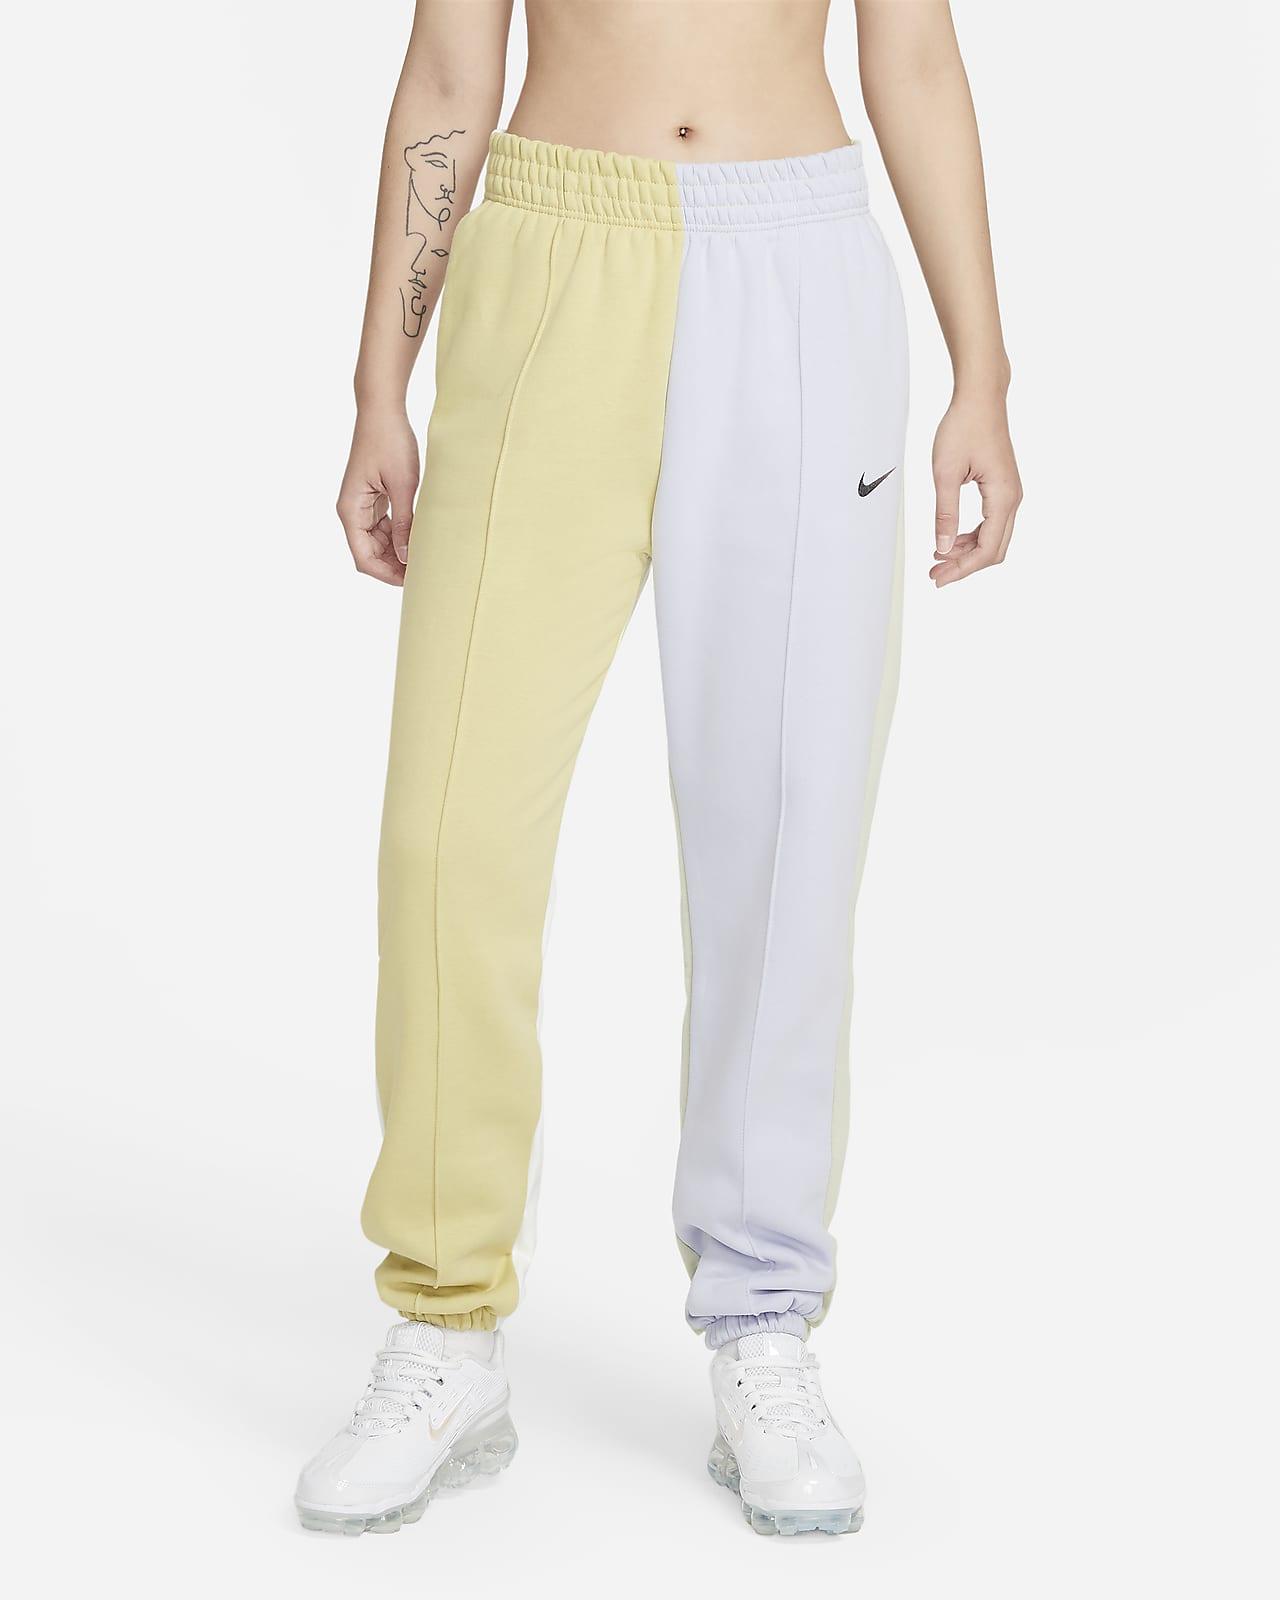 Pantalon Nike Sportswear Essential pour Femme